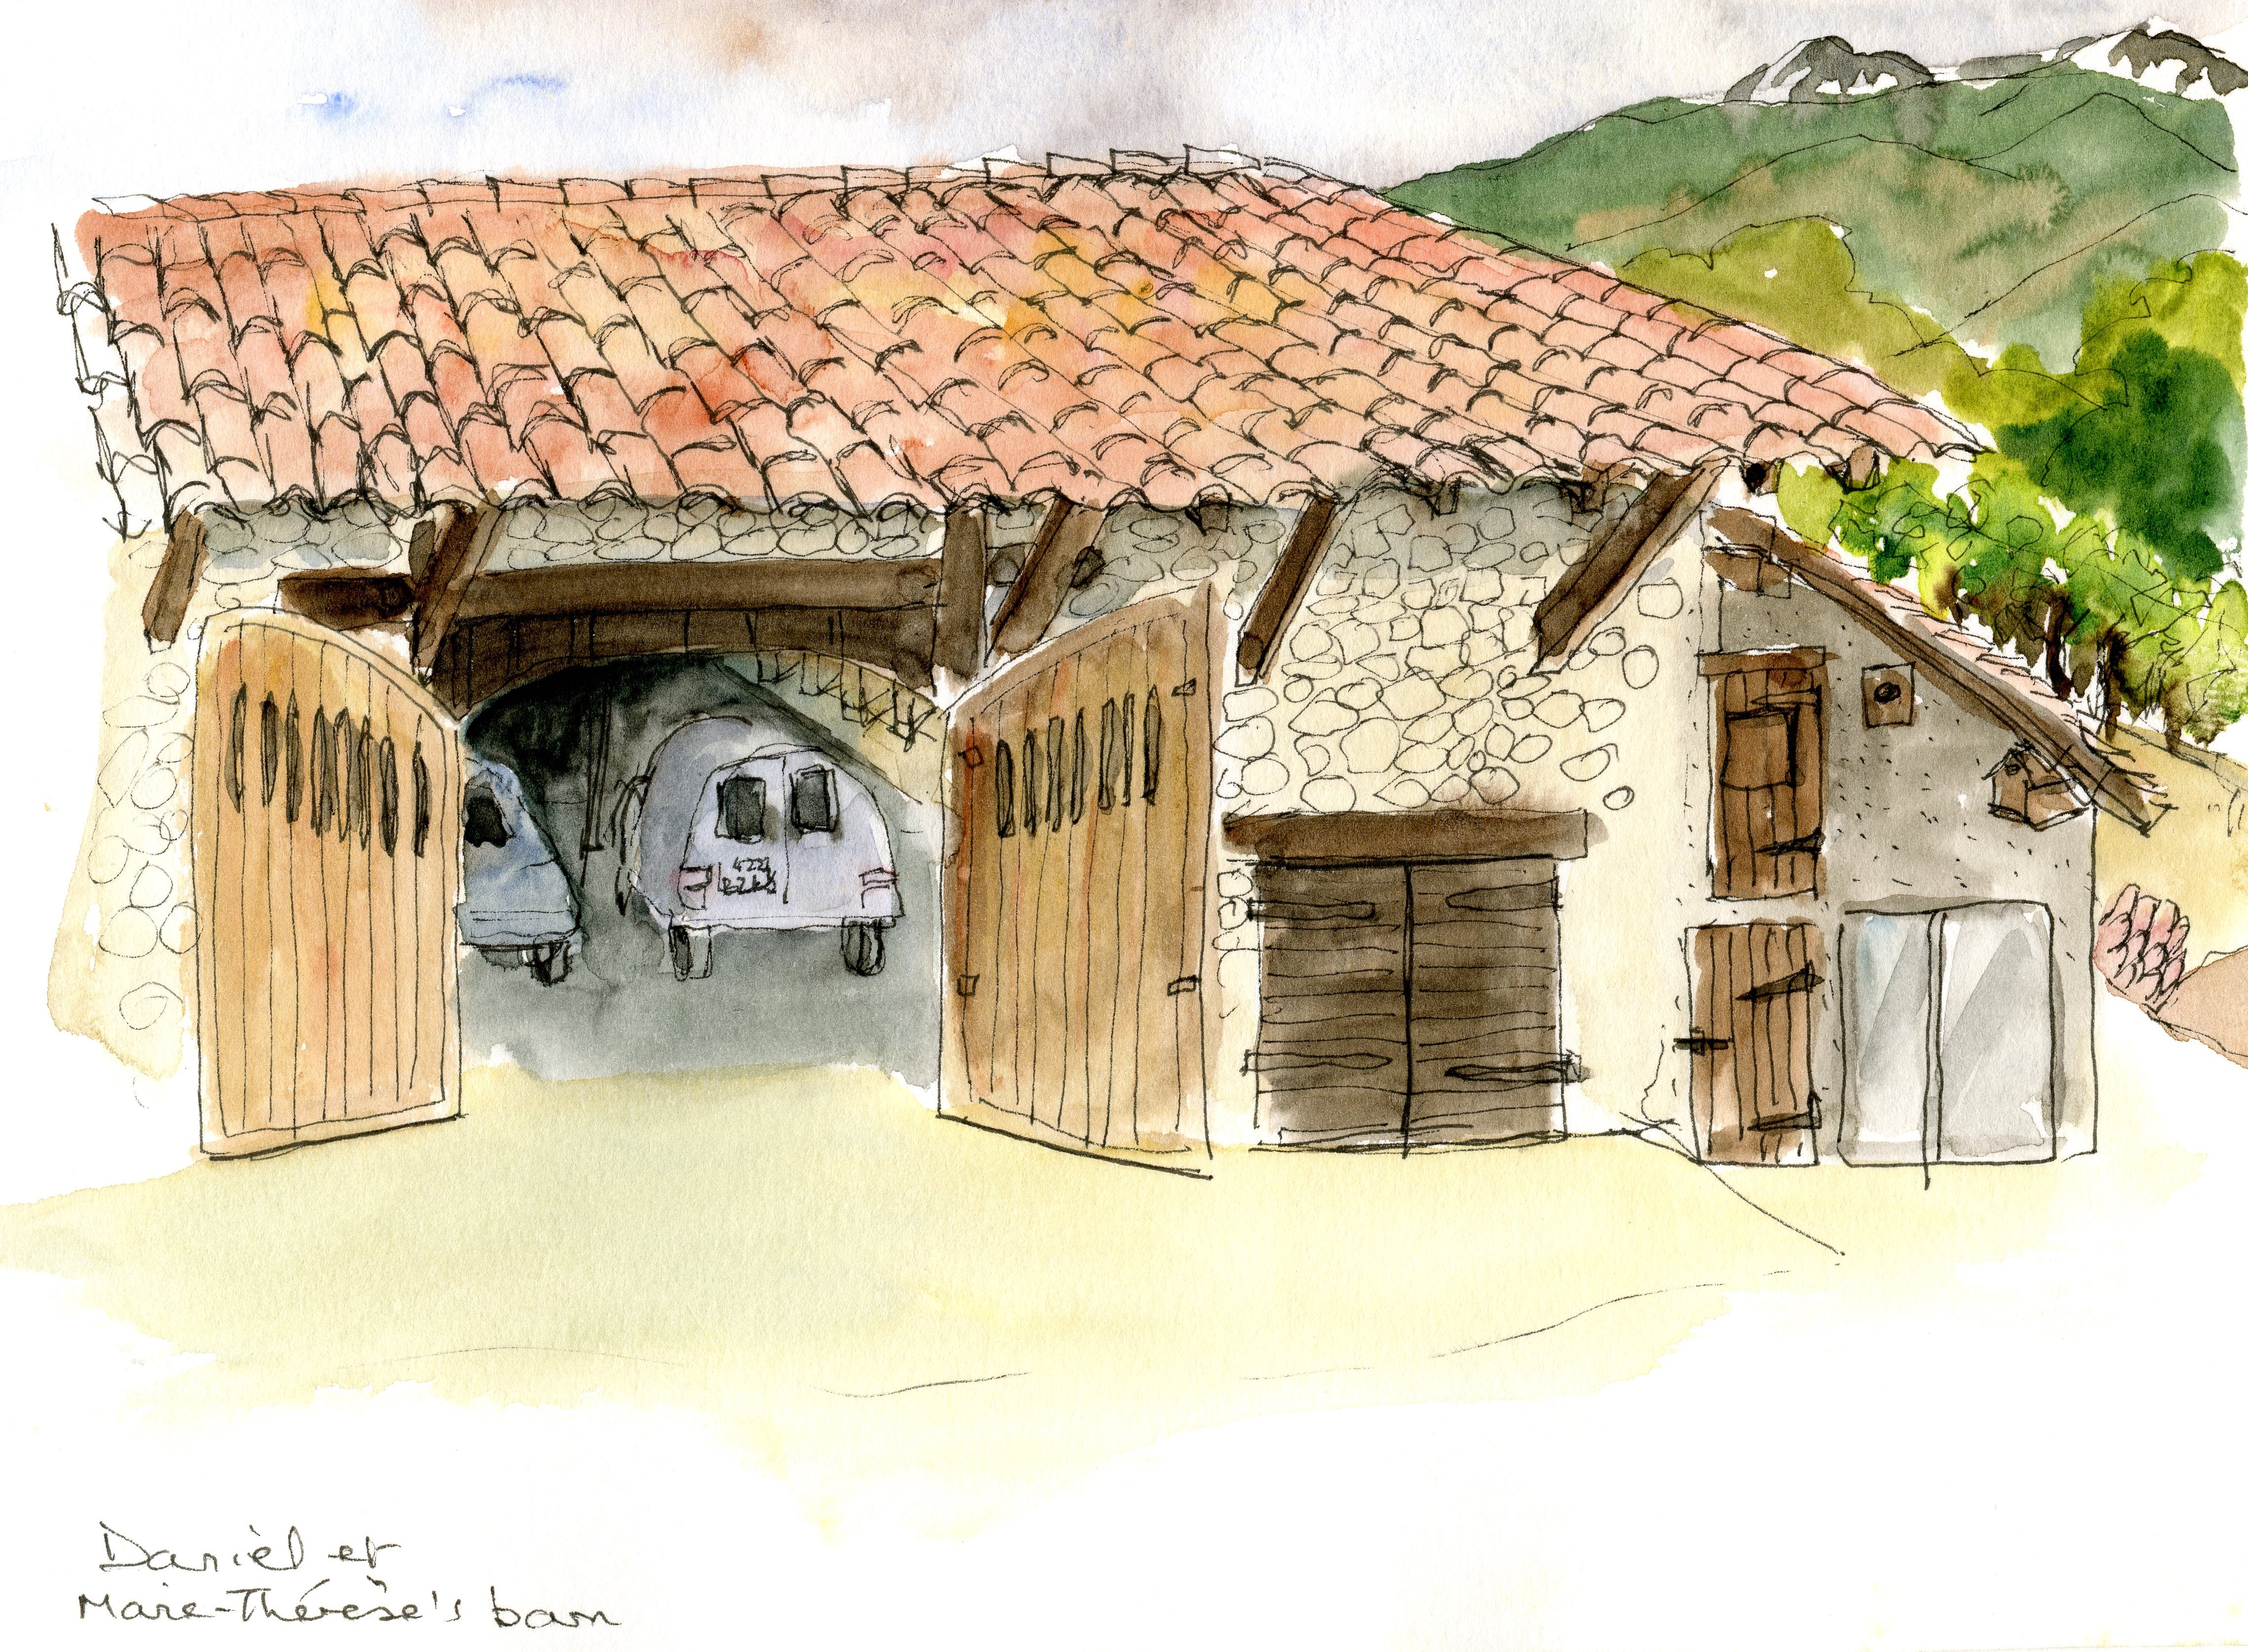 M-T's barn, France